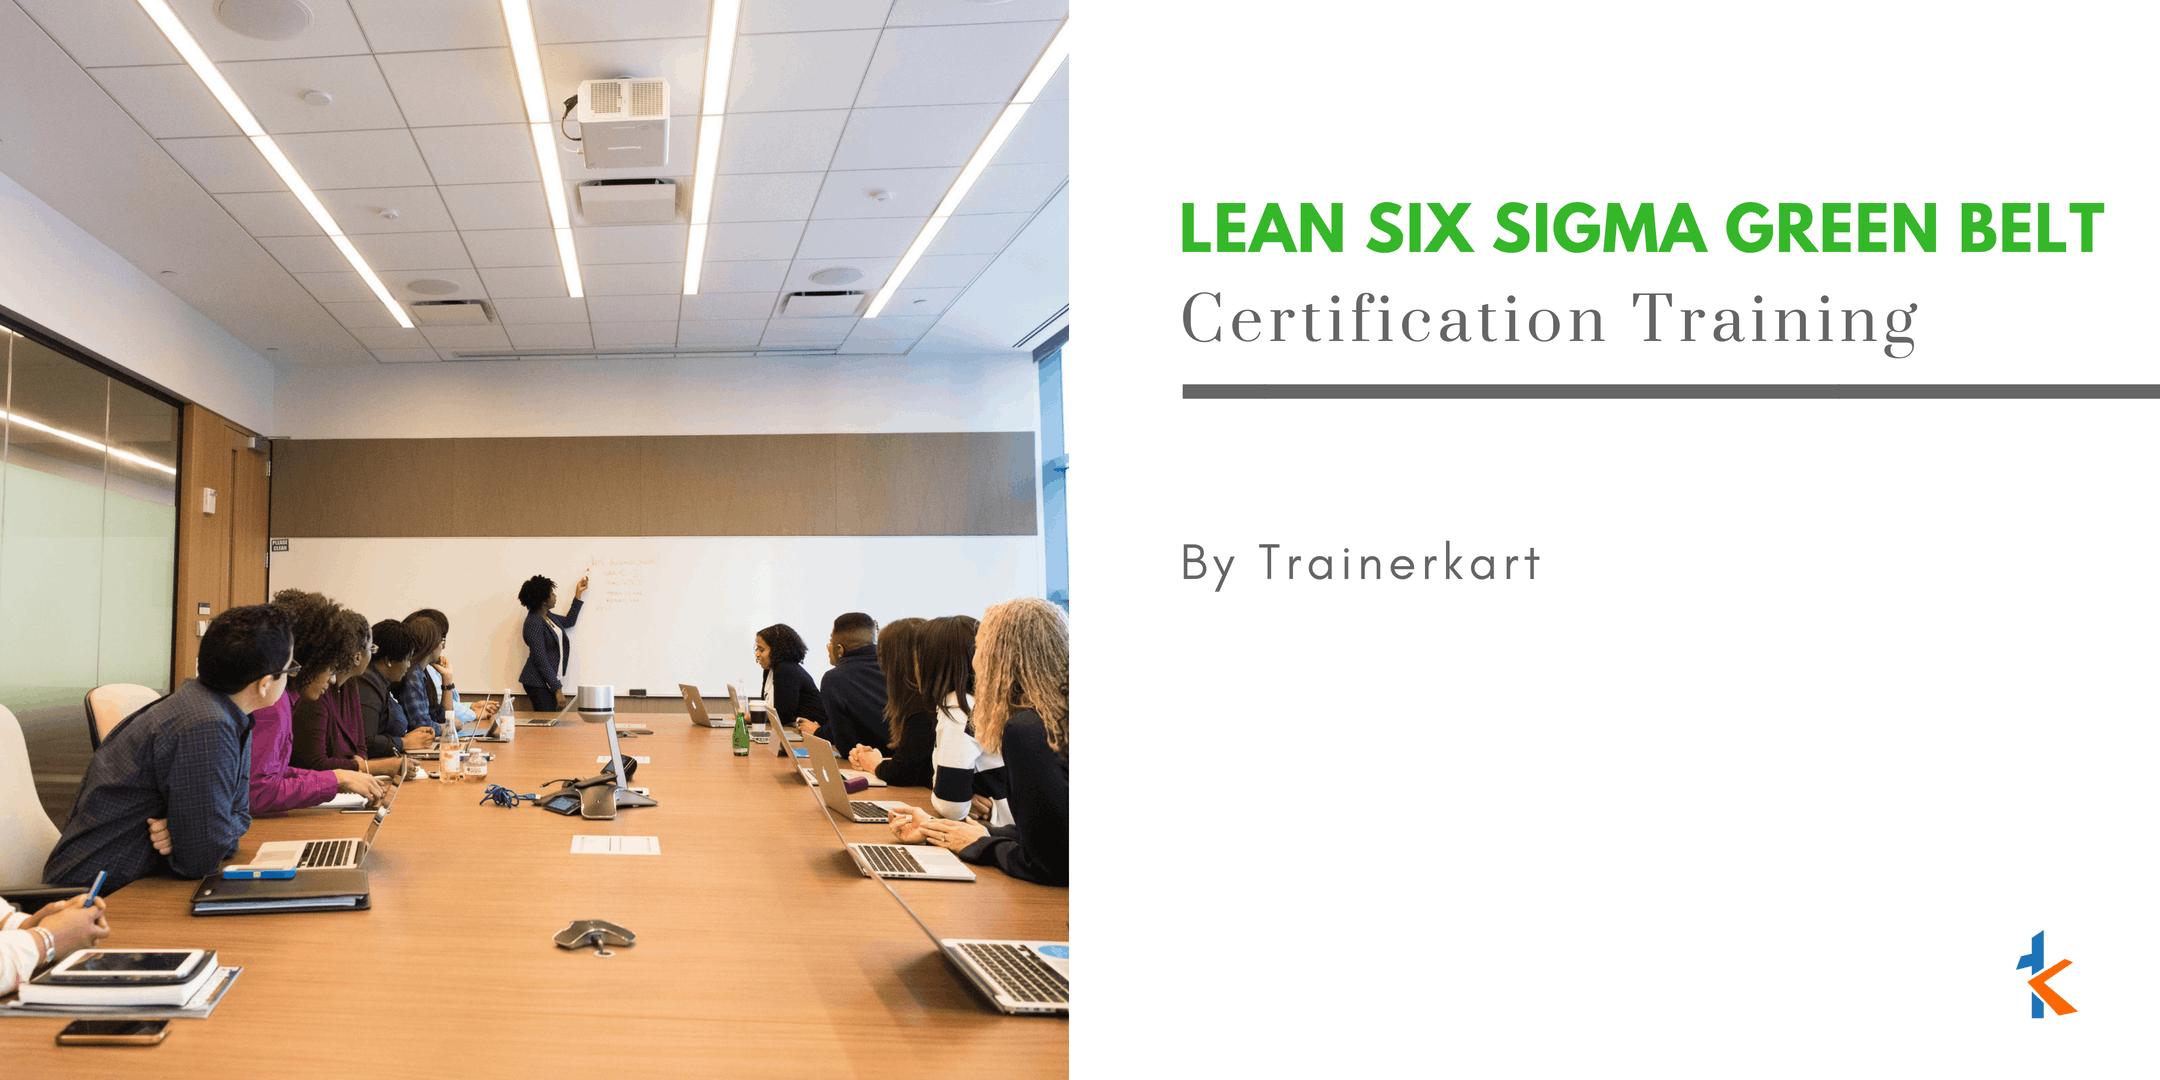 Lean Six Sigma Green Belt Training in Charlot